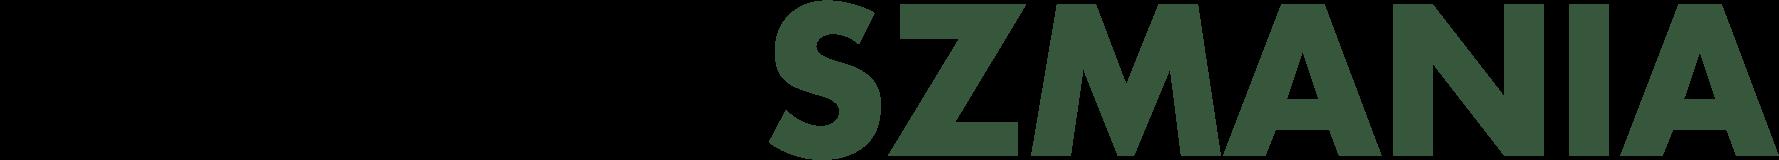 Friseur Szmania GmbH